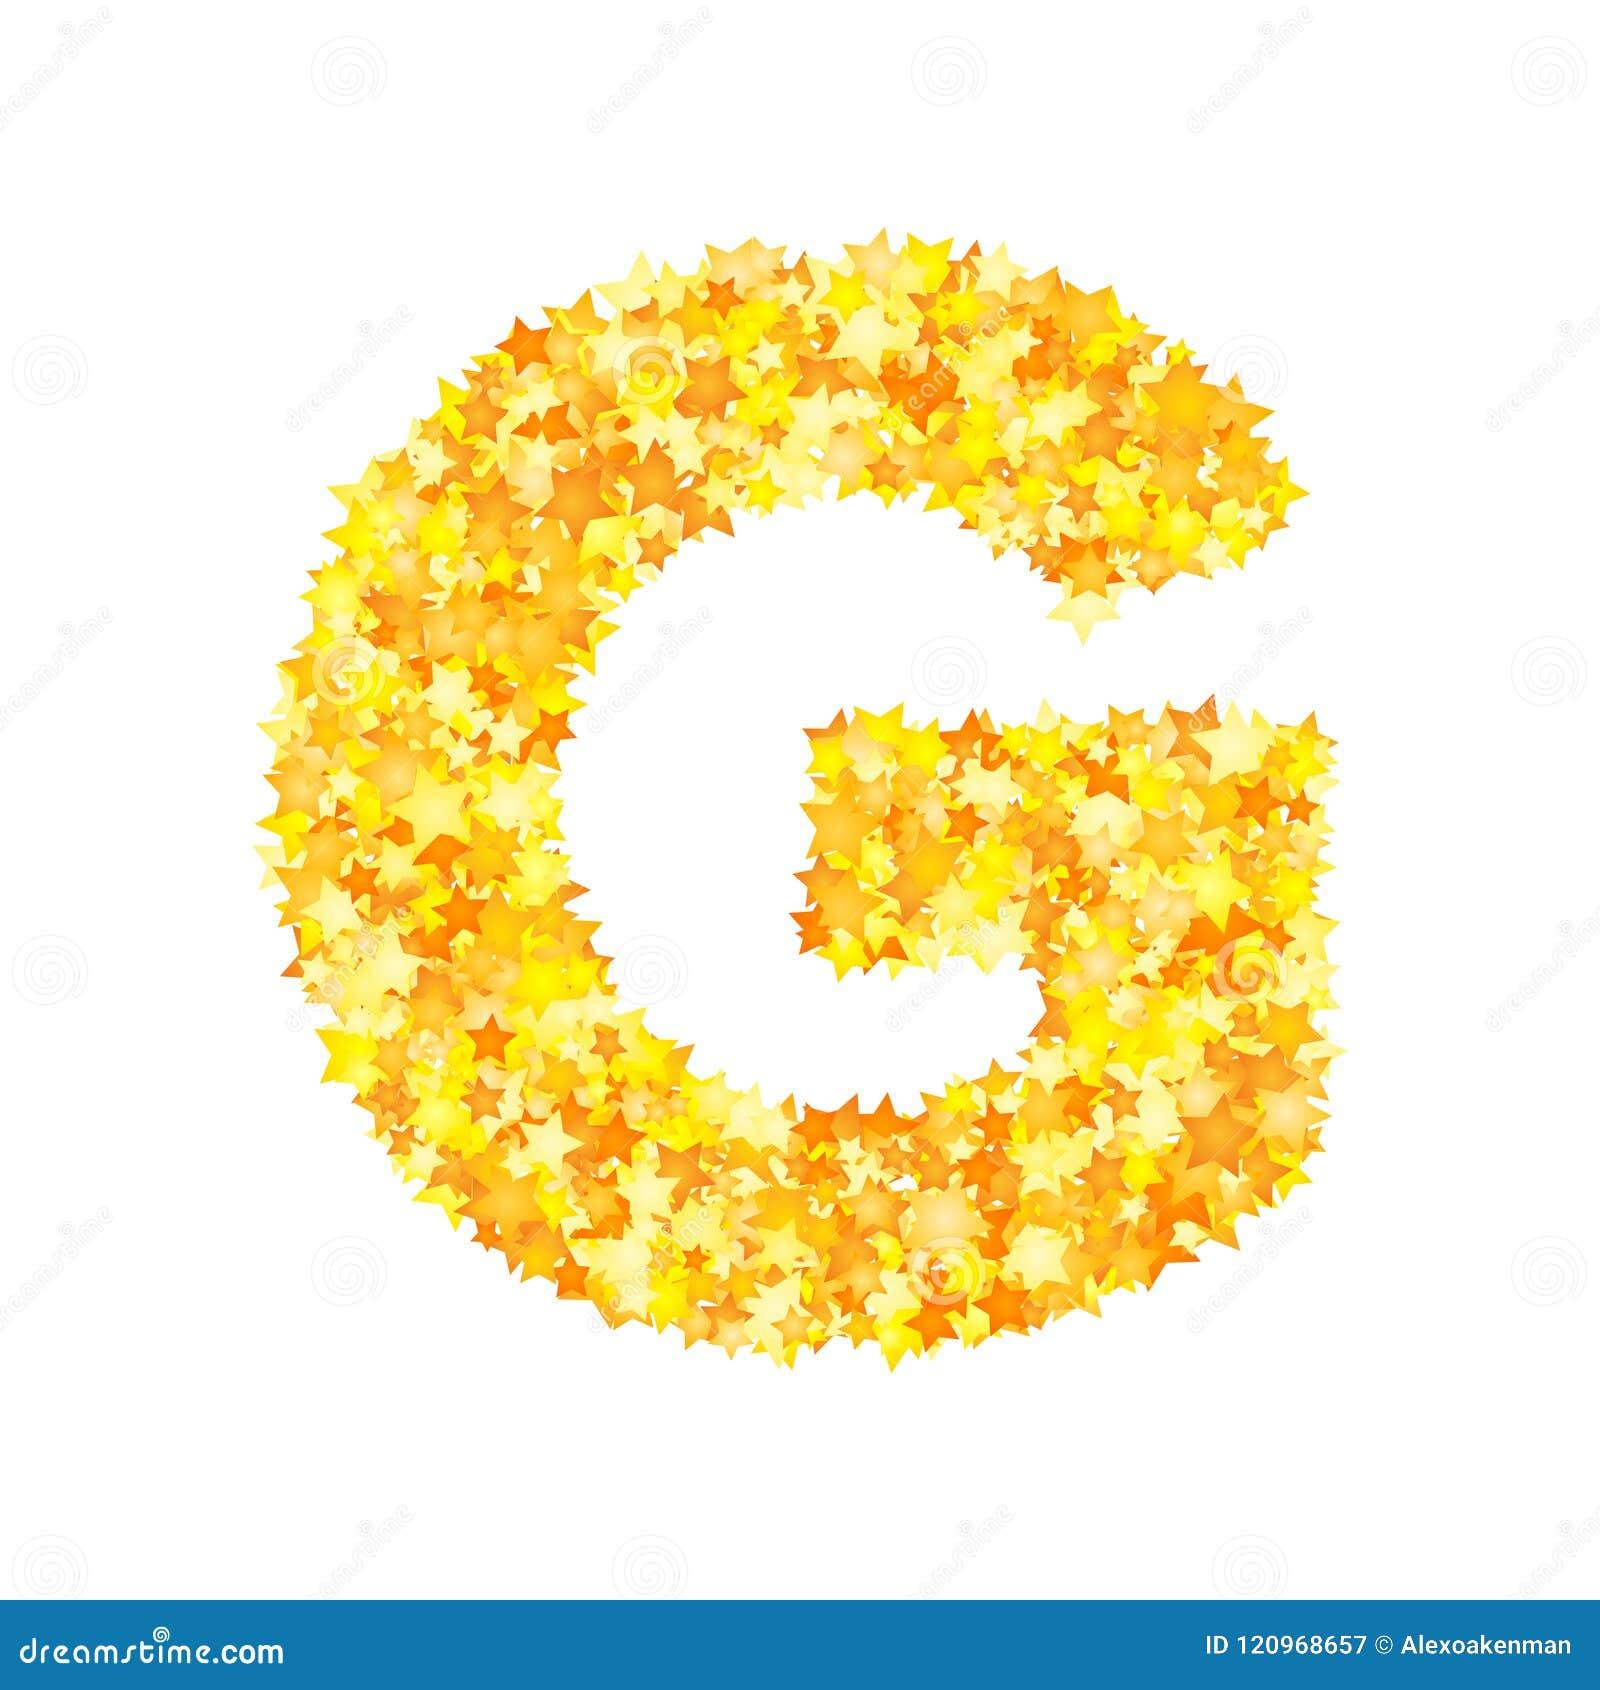 Vector yellow stars font, letter G